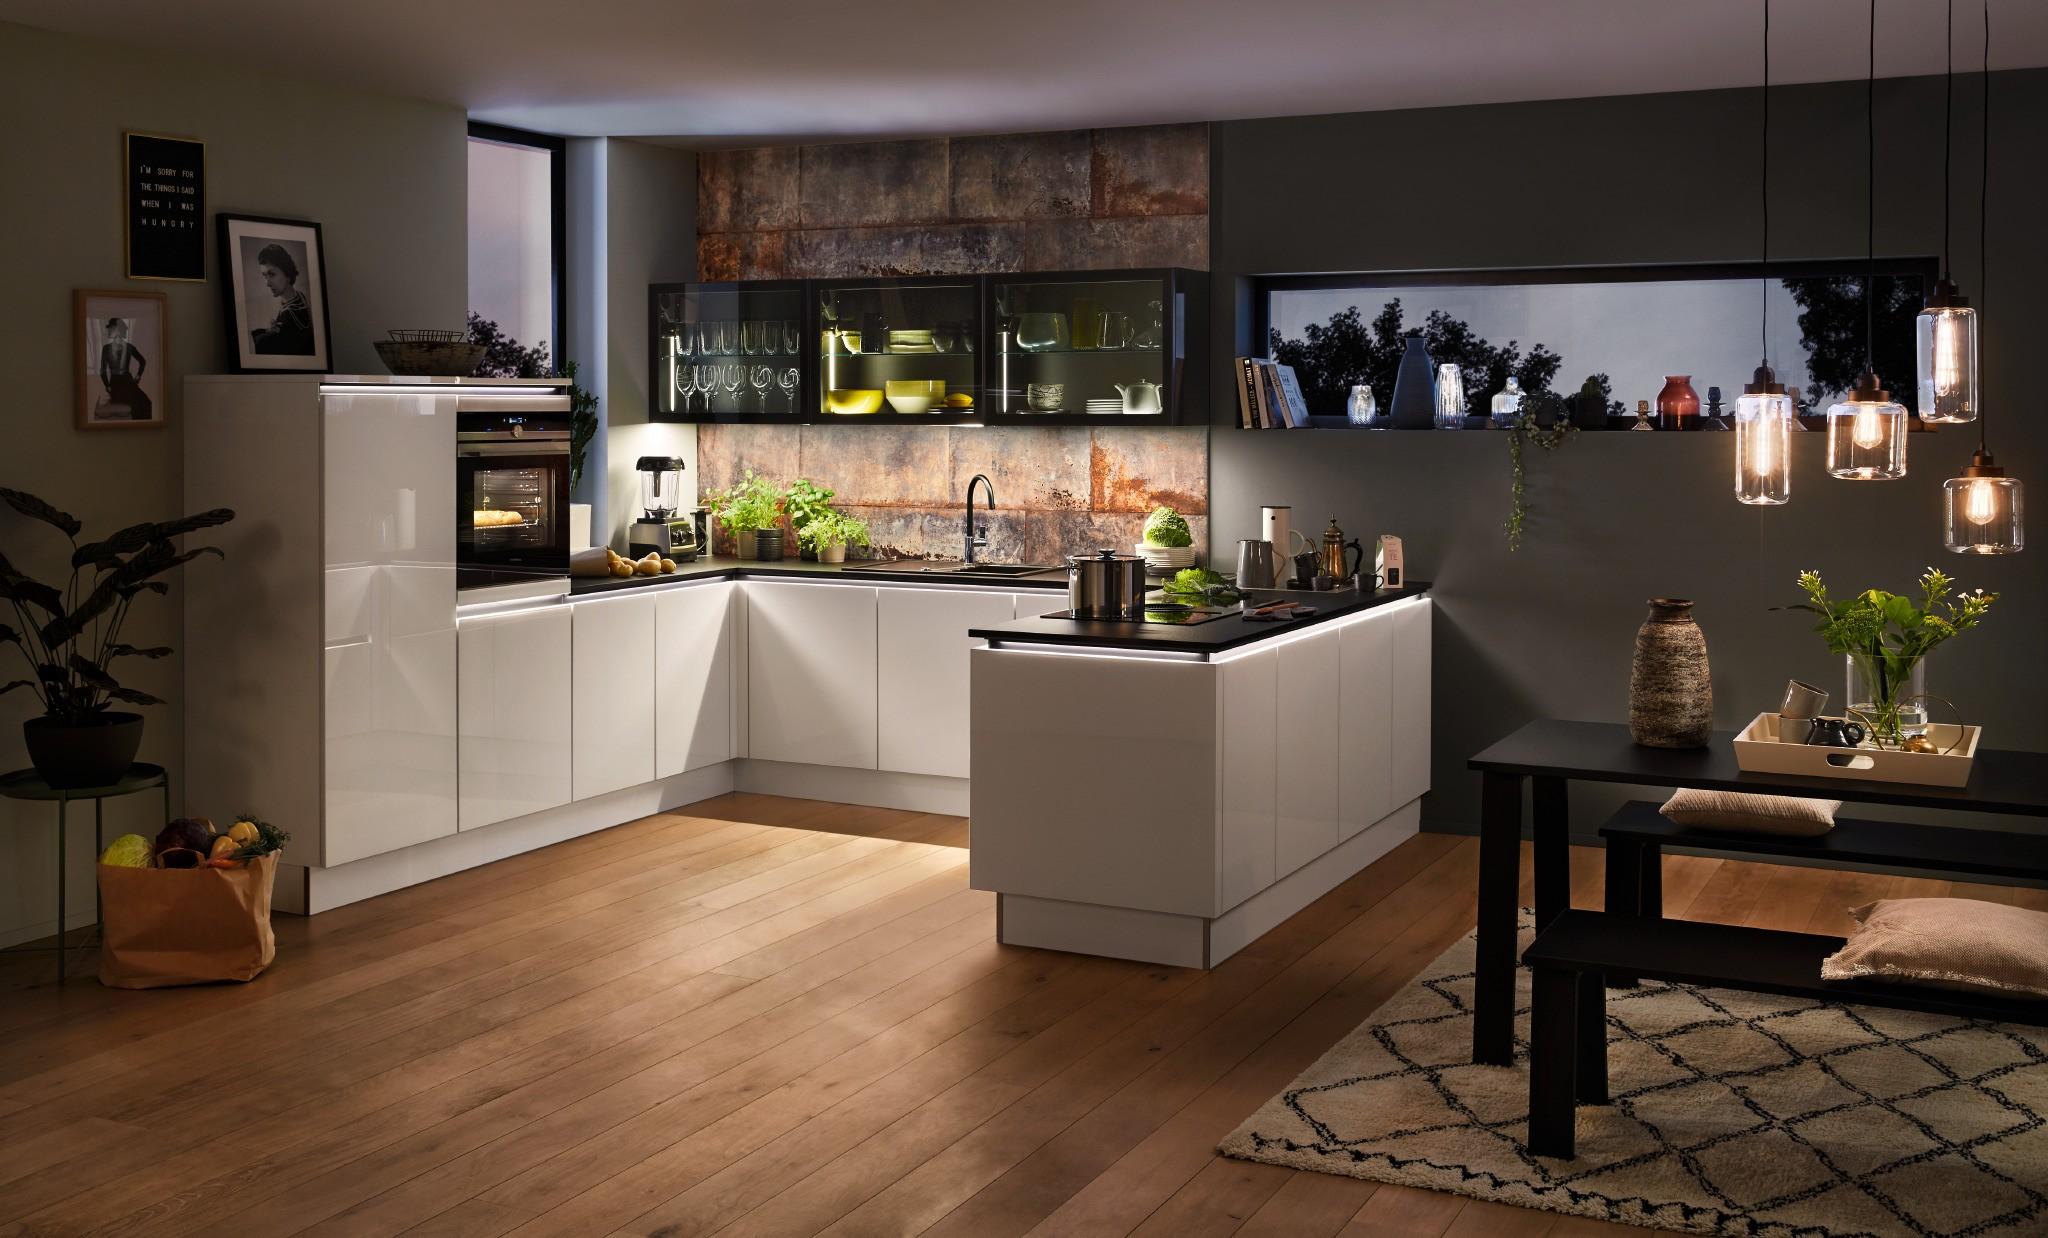 Creative Designs Kitchens Ltd Linkedin